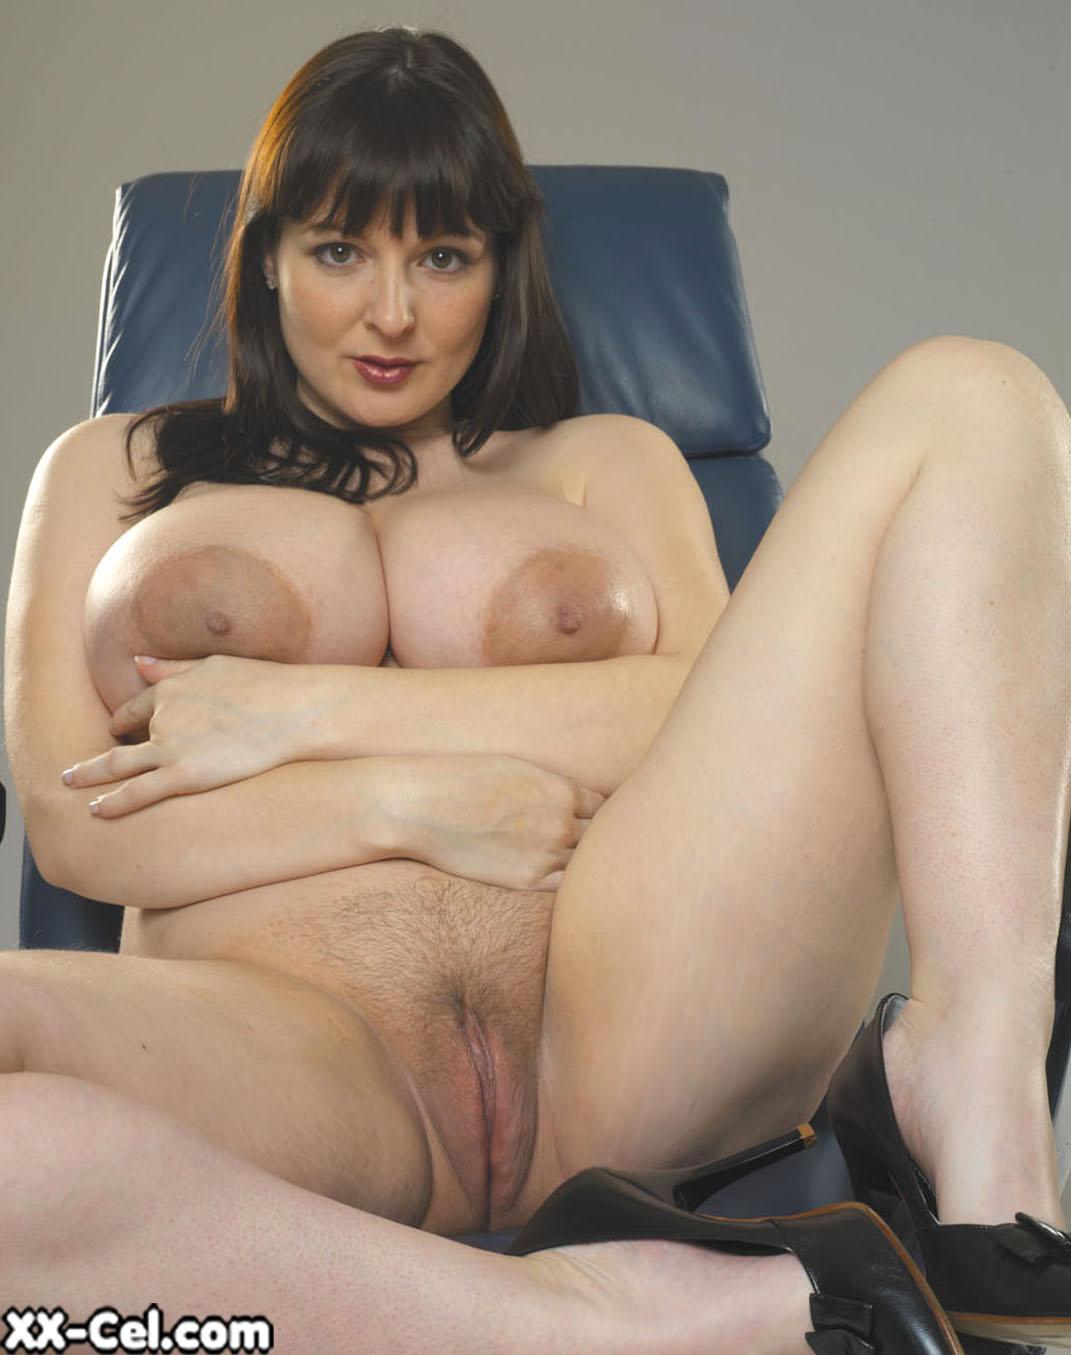 Jennifer grey nude pics-9108